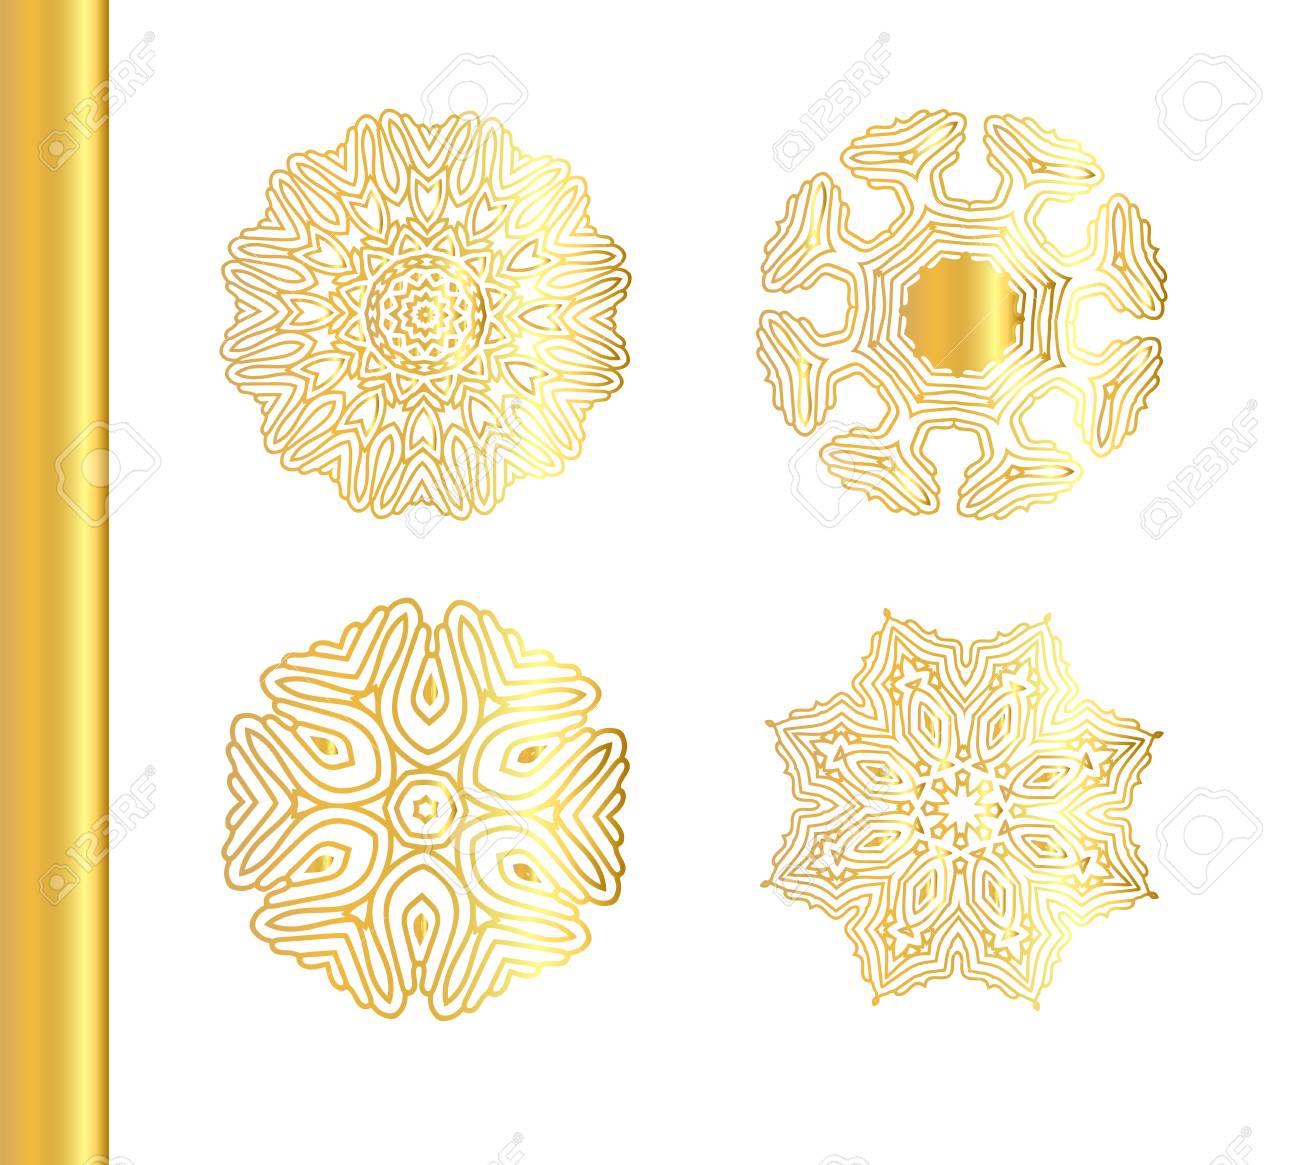 Indian Asiatische Arabischen Ottomane Motiv. Vector Bordüre Rahmen ...